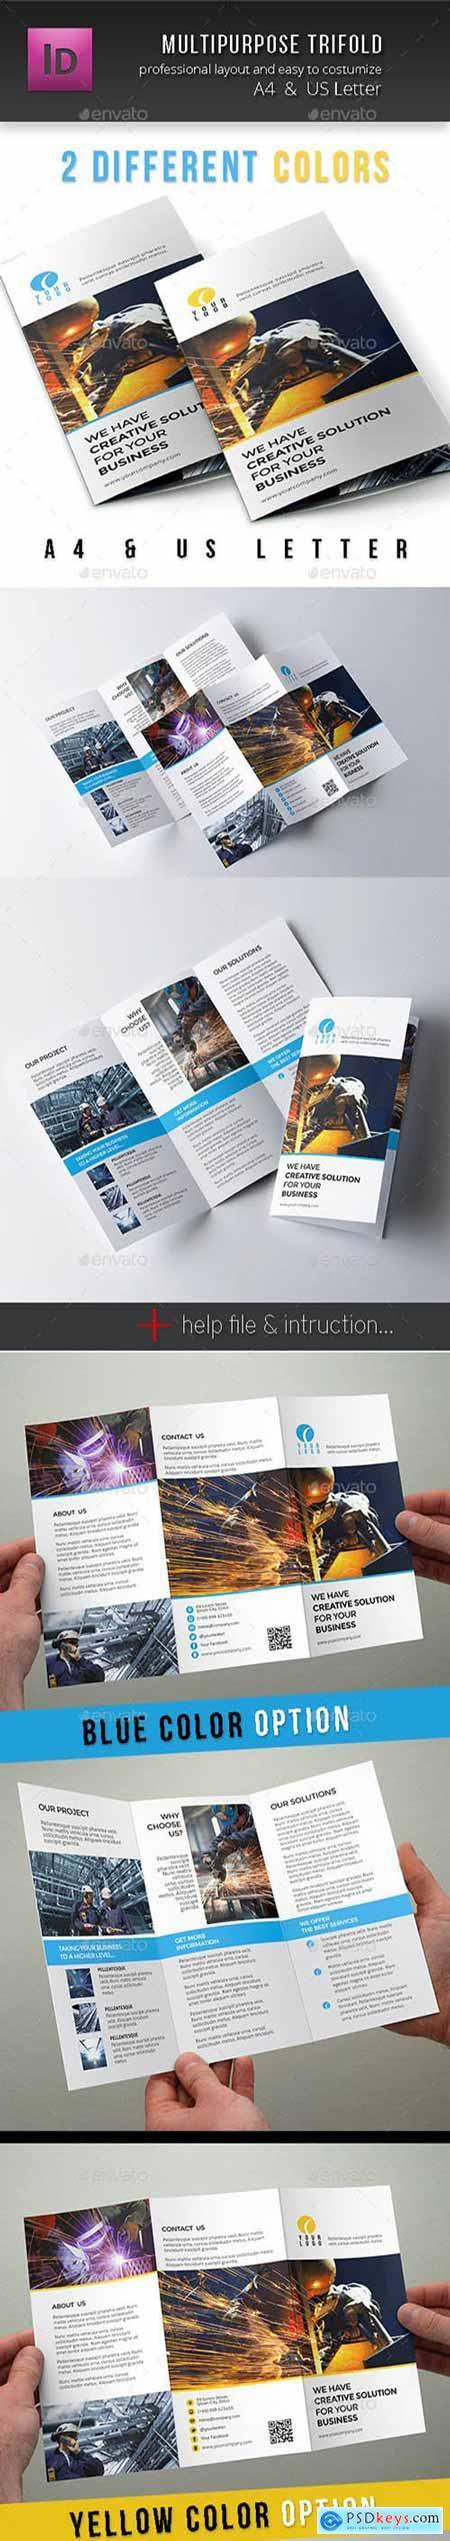 Multipurpose Corporate Trifold 10787042